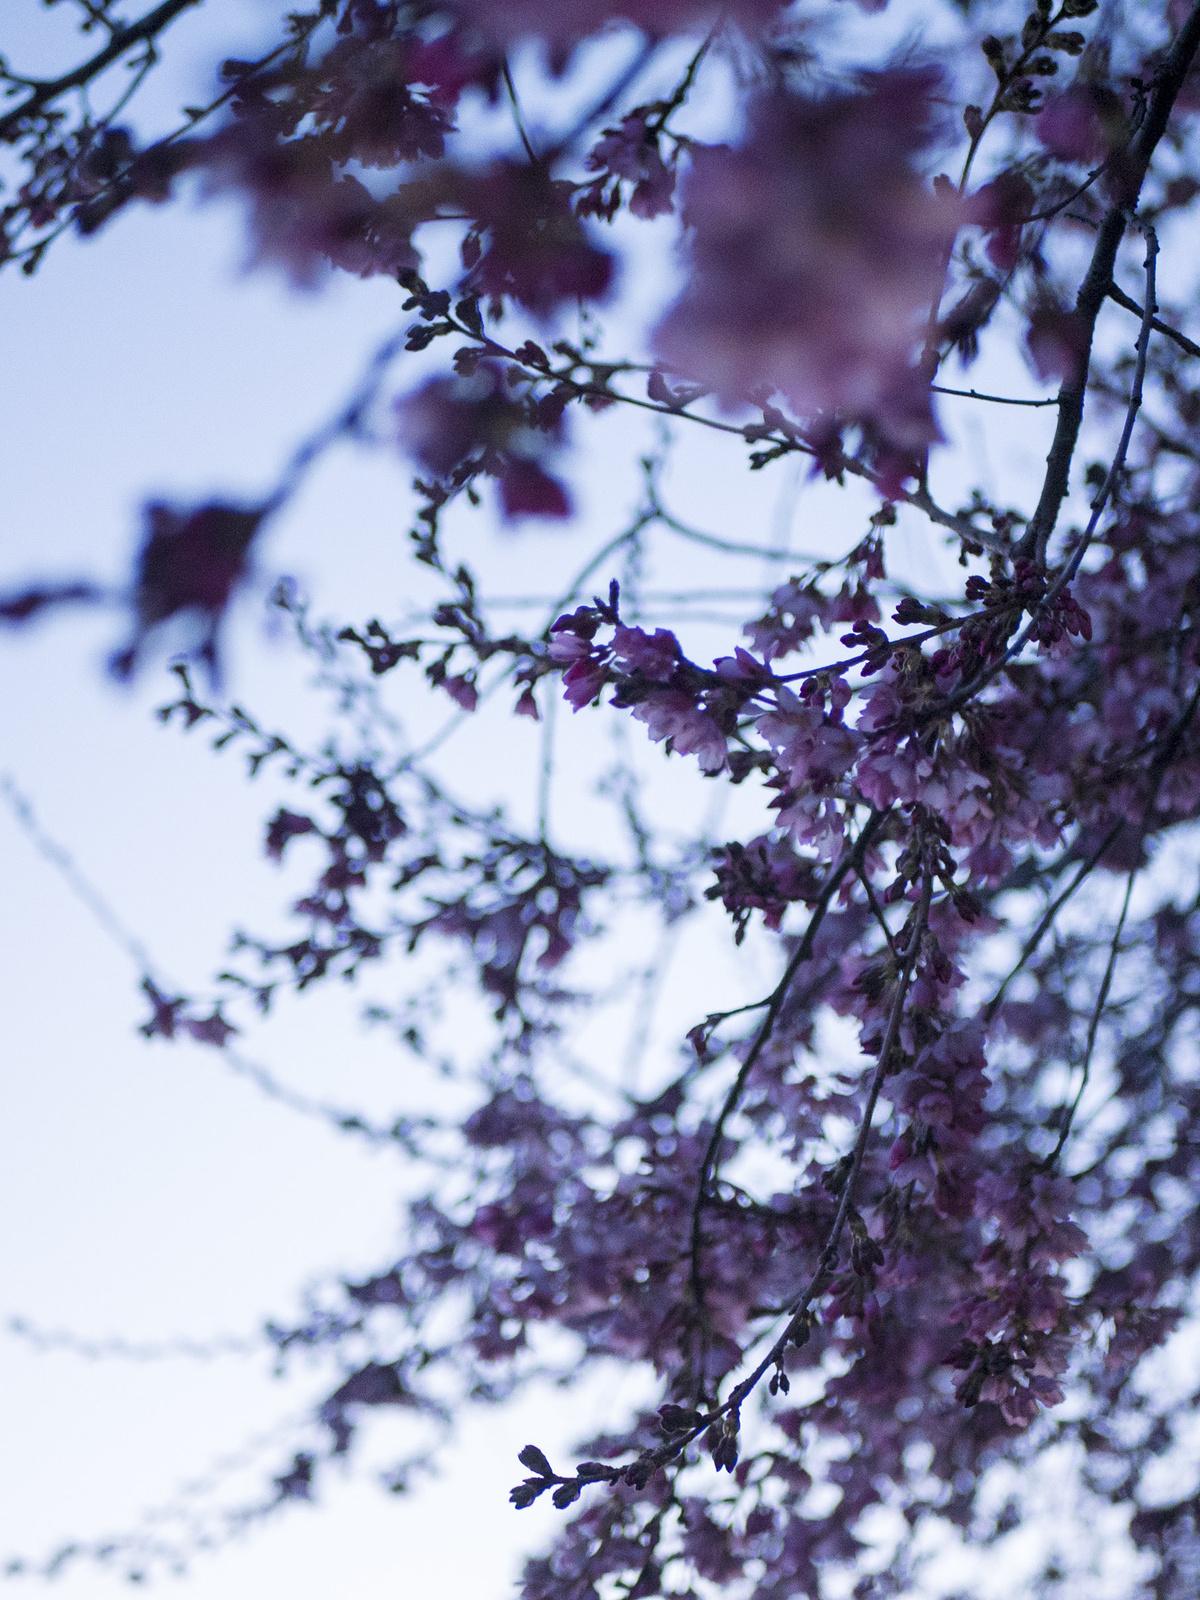 cherry blossoms begin